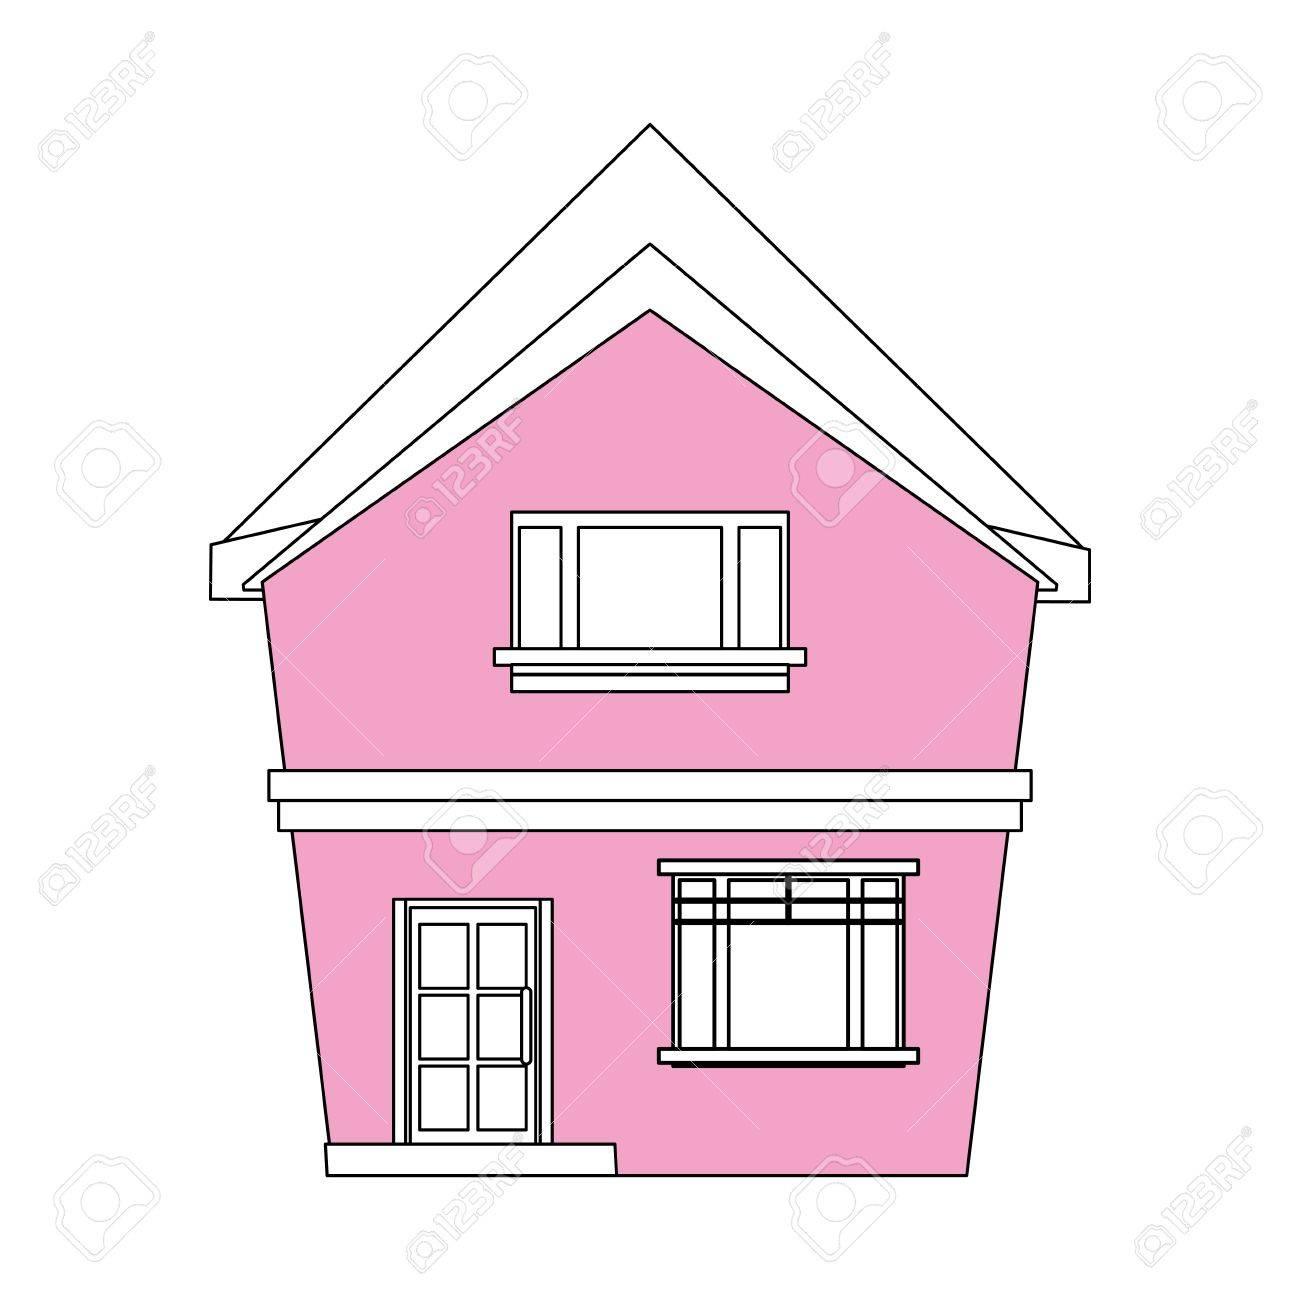 House Cartoon Color Image Logo   colorimage.website